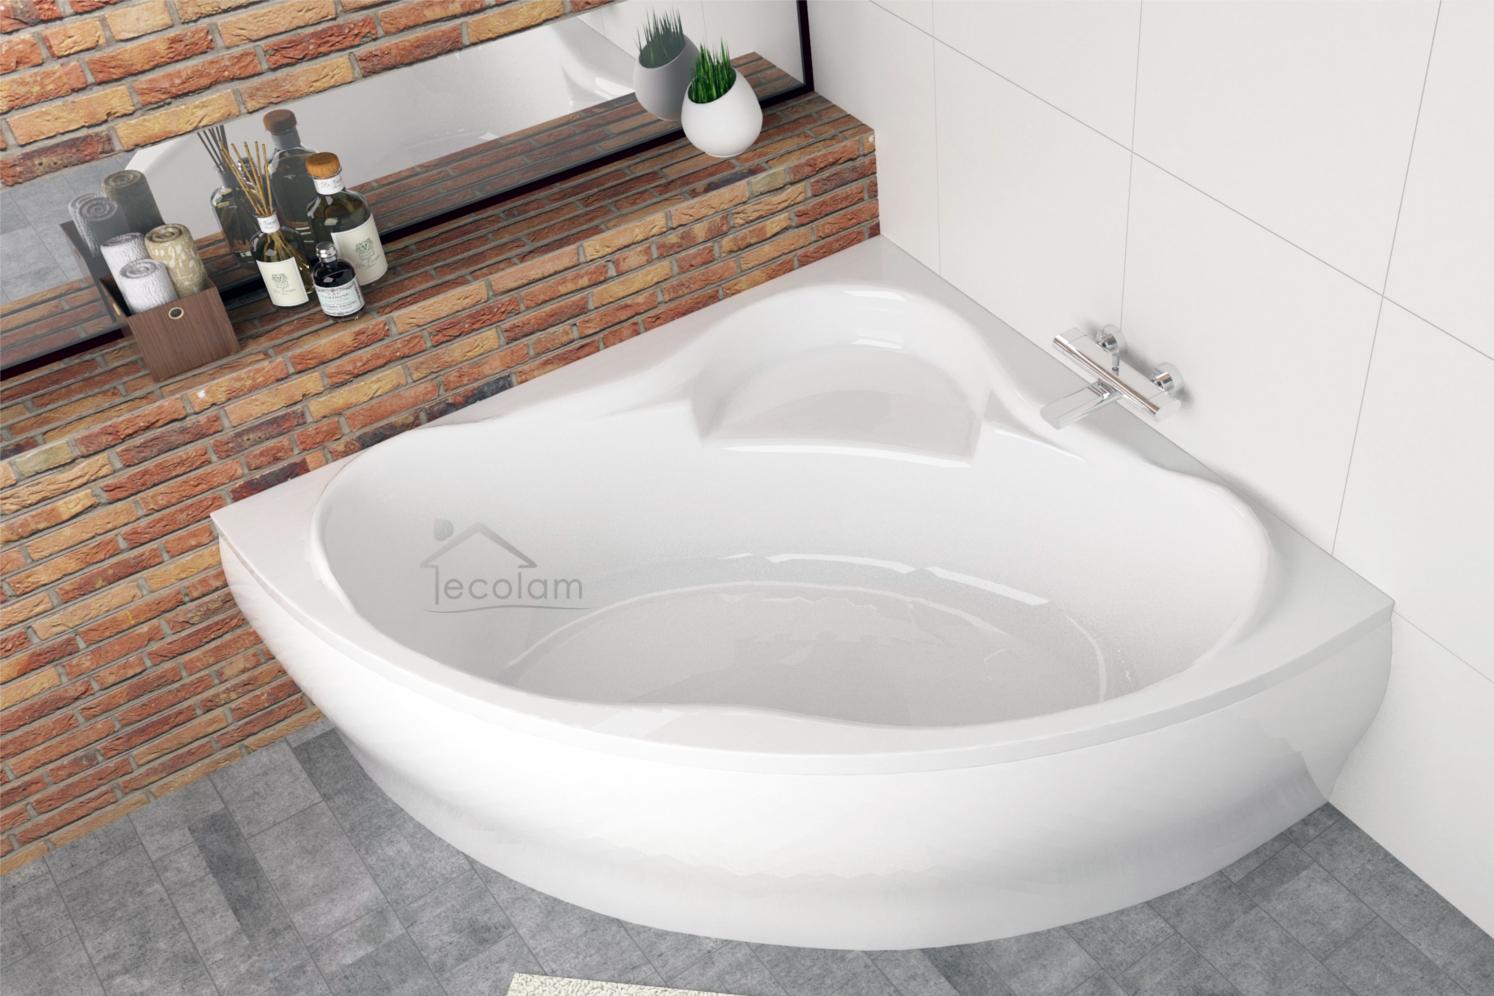 badewanne wanne eckbadewanne 150 x 150 cm optional sch rze. Black Bedroom Furniture Sets. Home Design Ideas